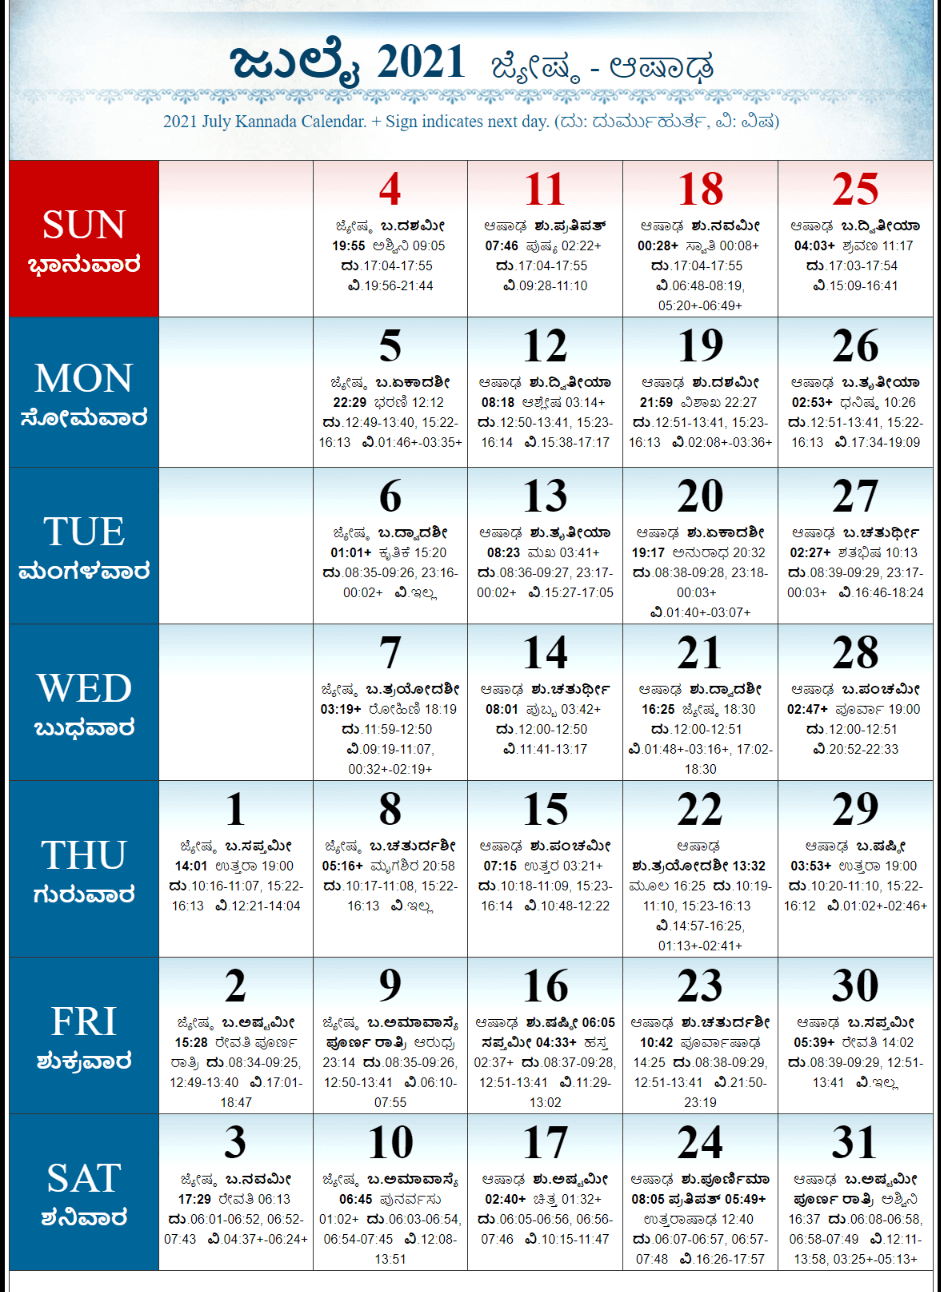 July 2021 Kannada Calendar